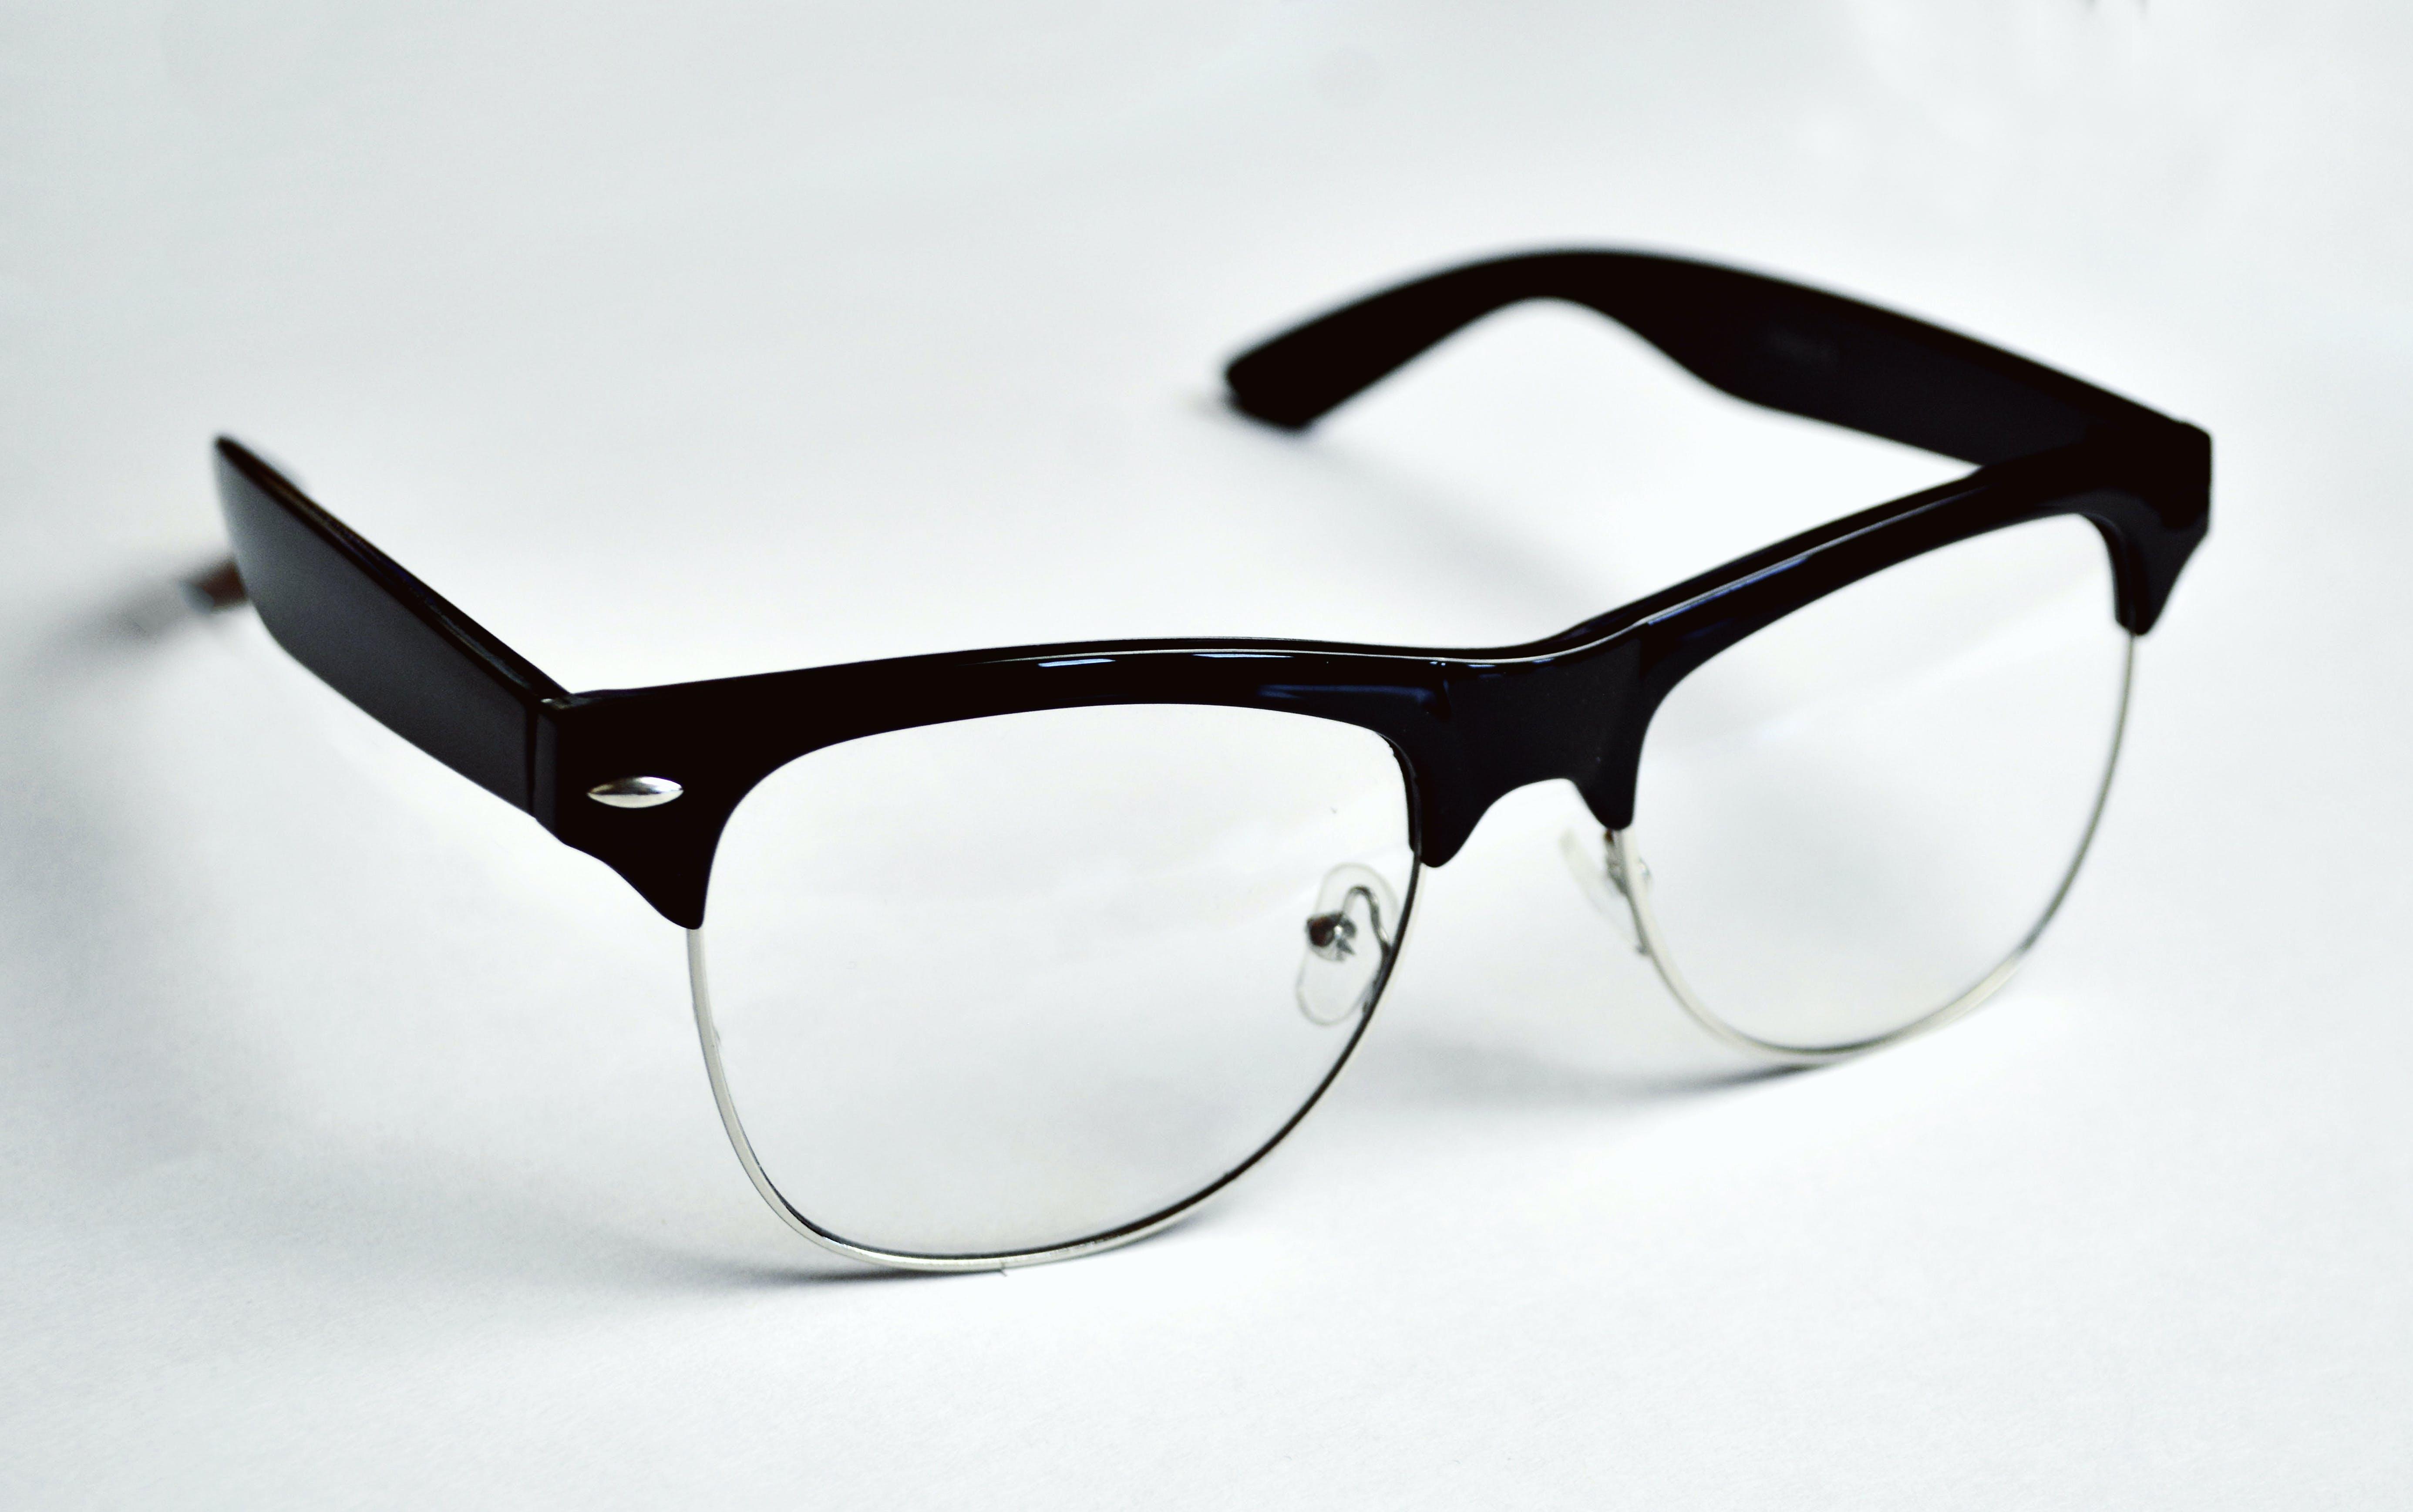 Black Framed Clubmaster Style Eyeglasses